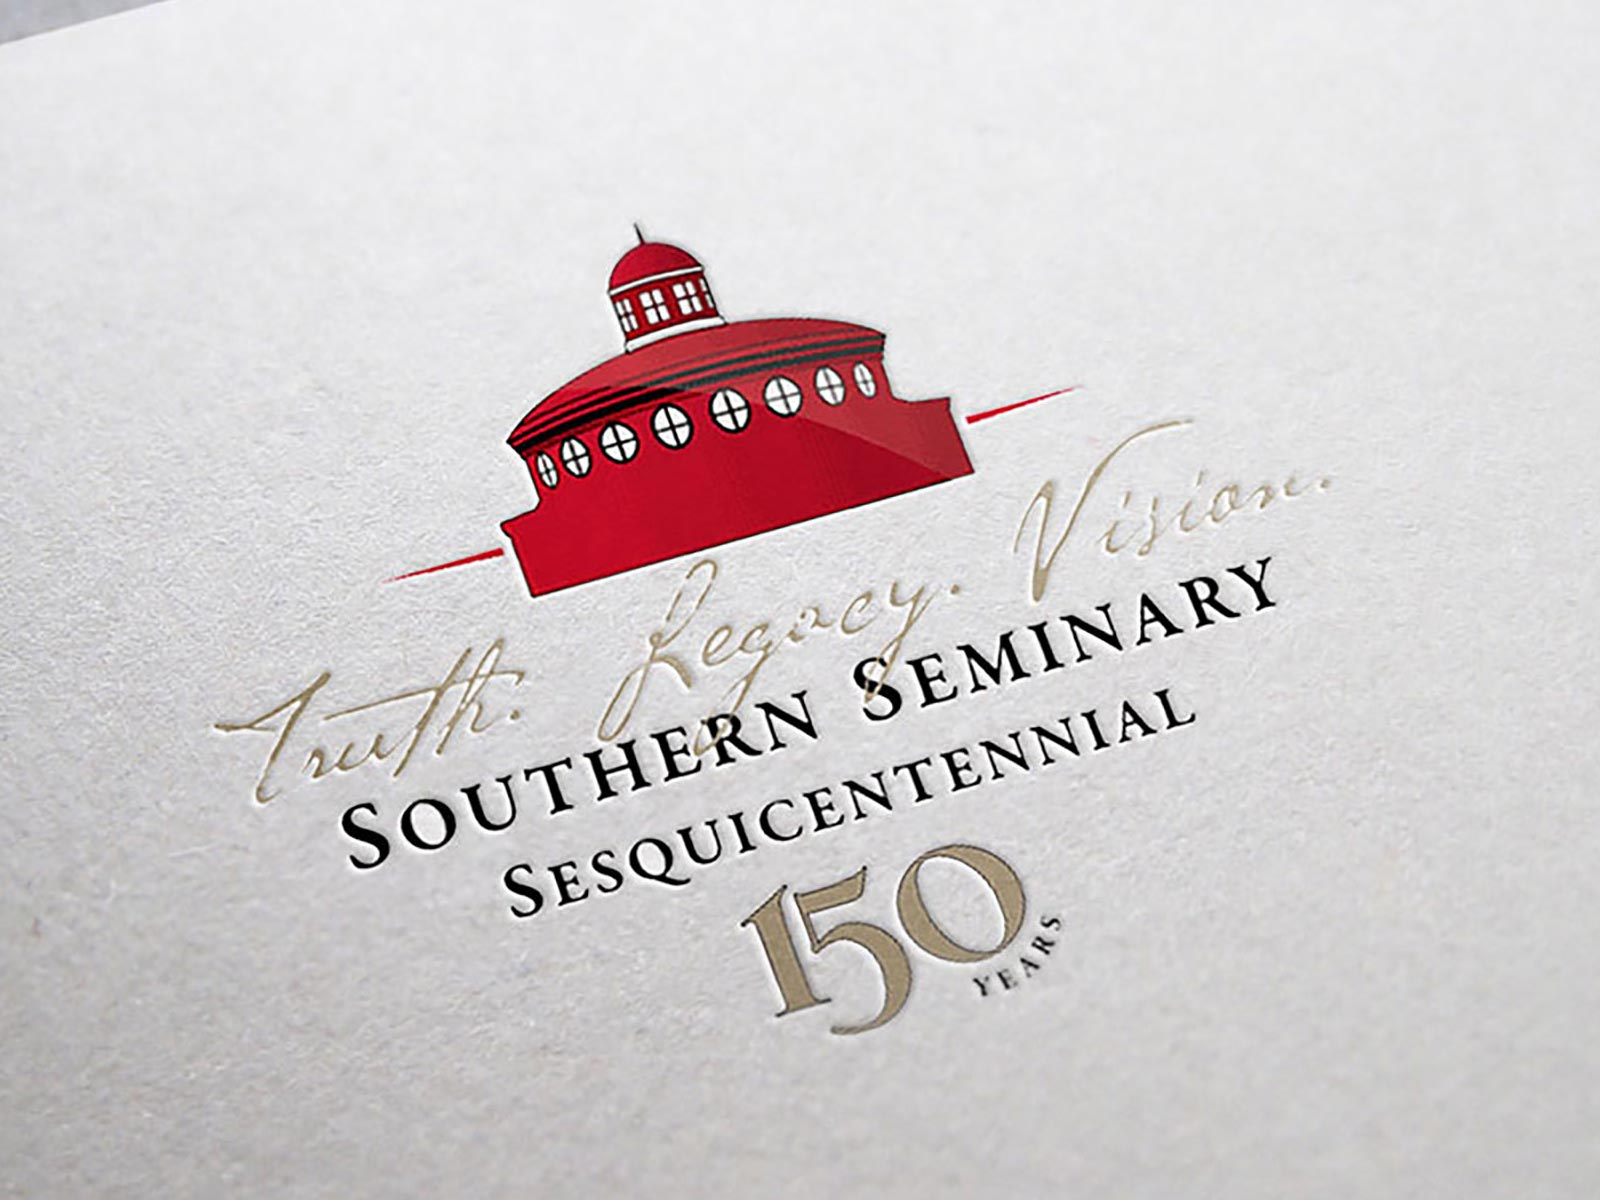 Southern Seminary